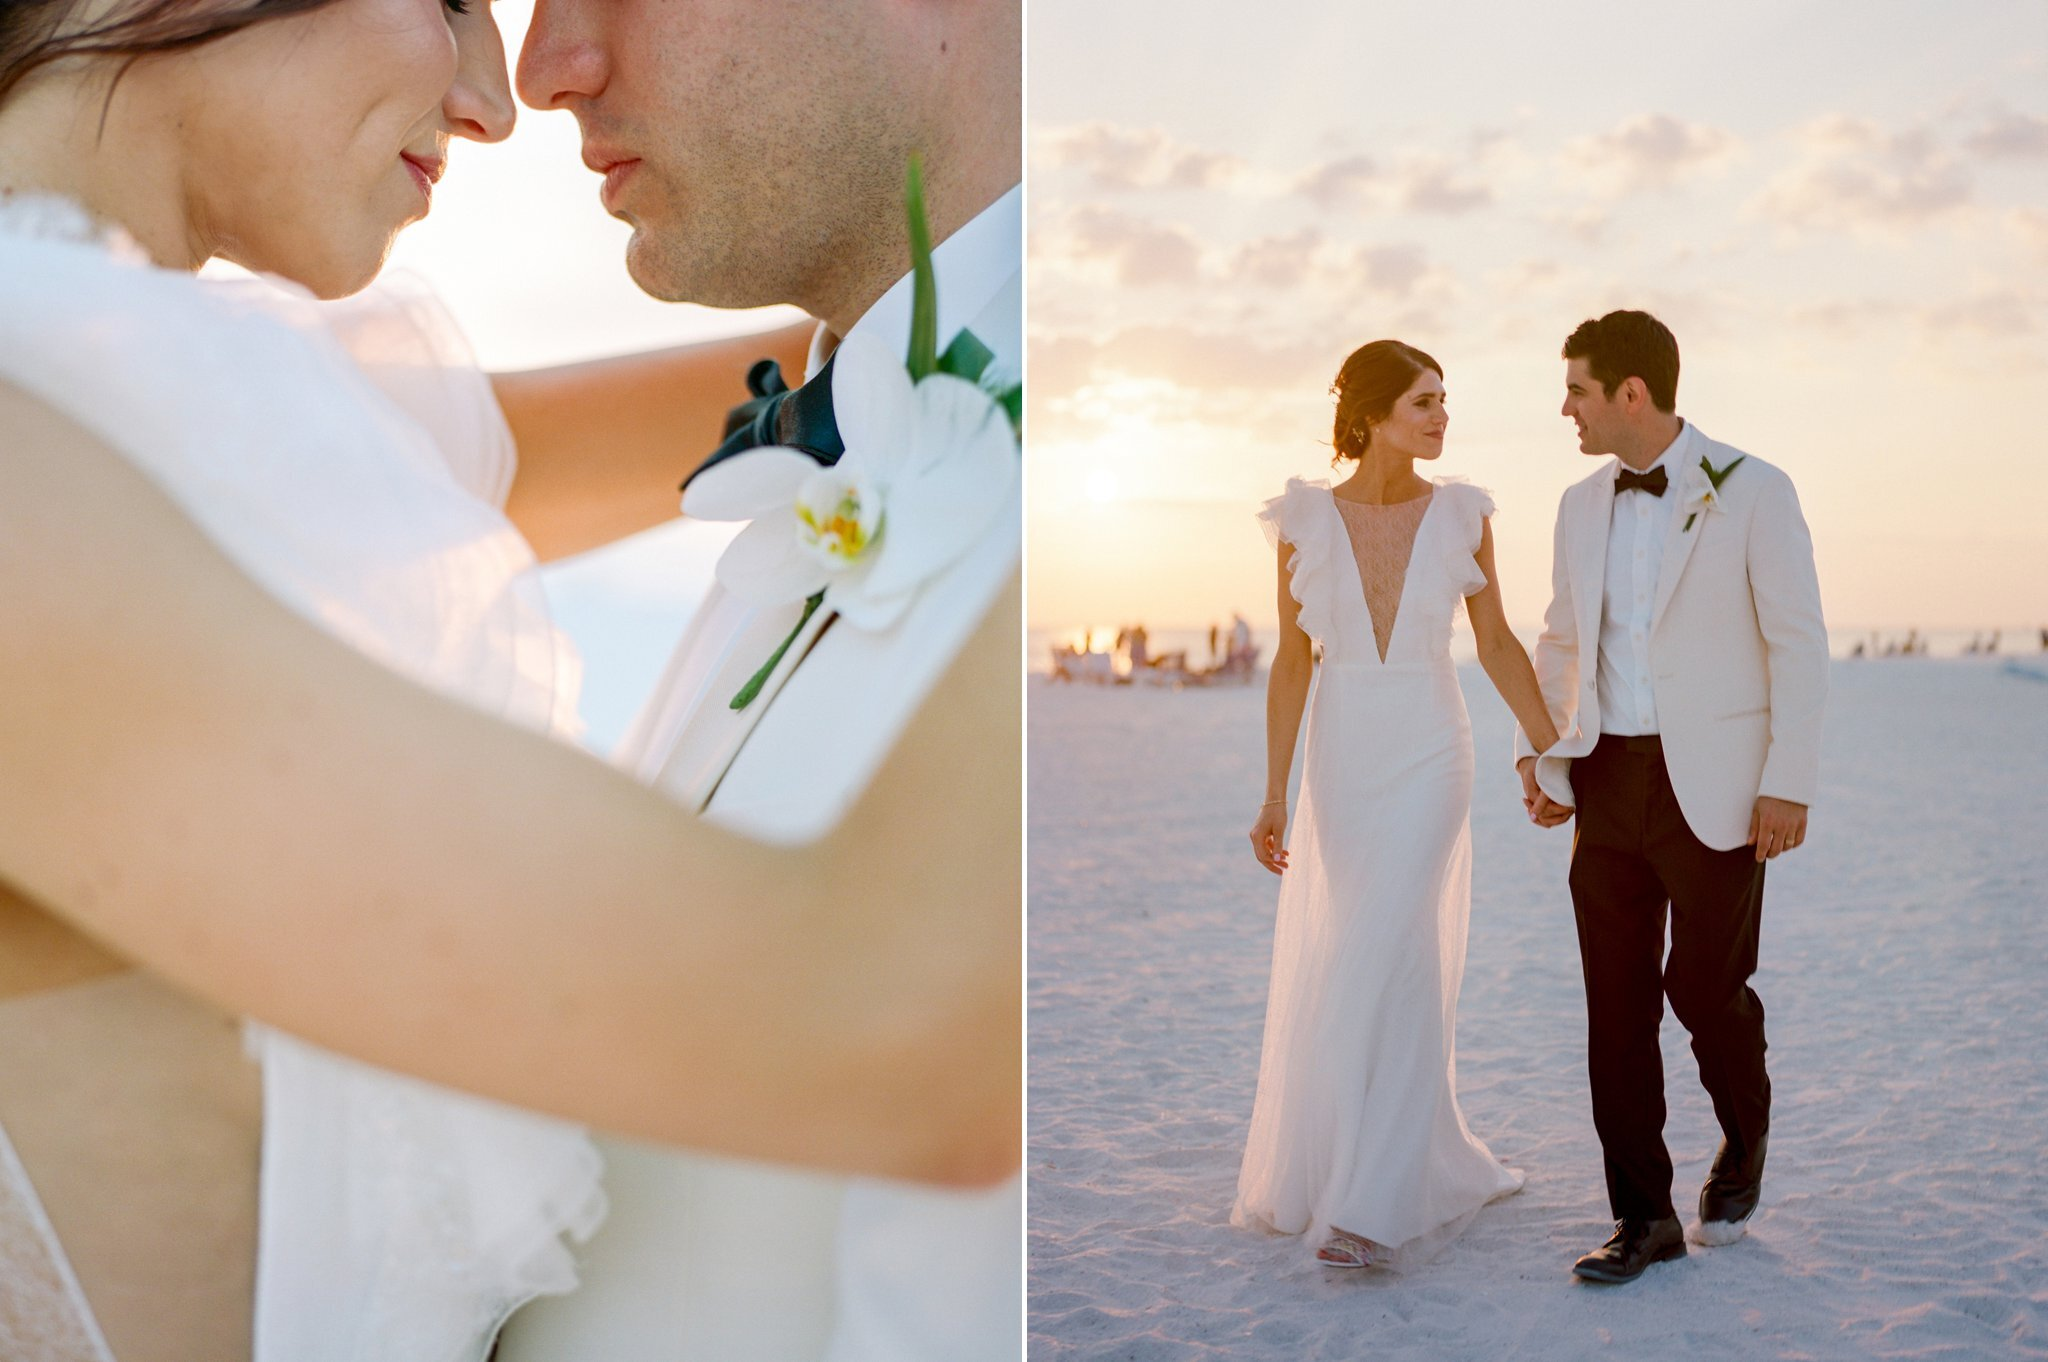 jw marriott marco island wedding photographer marco island wedding photographer shannon griffin photography_0204.jpg